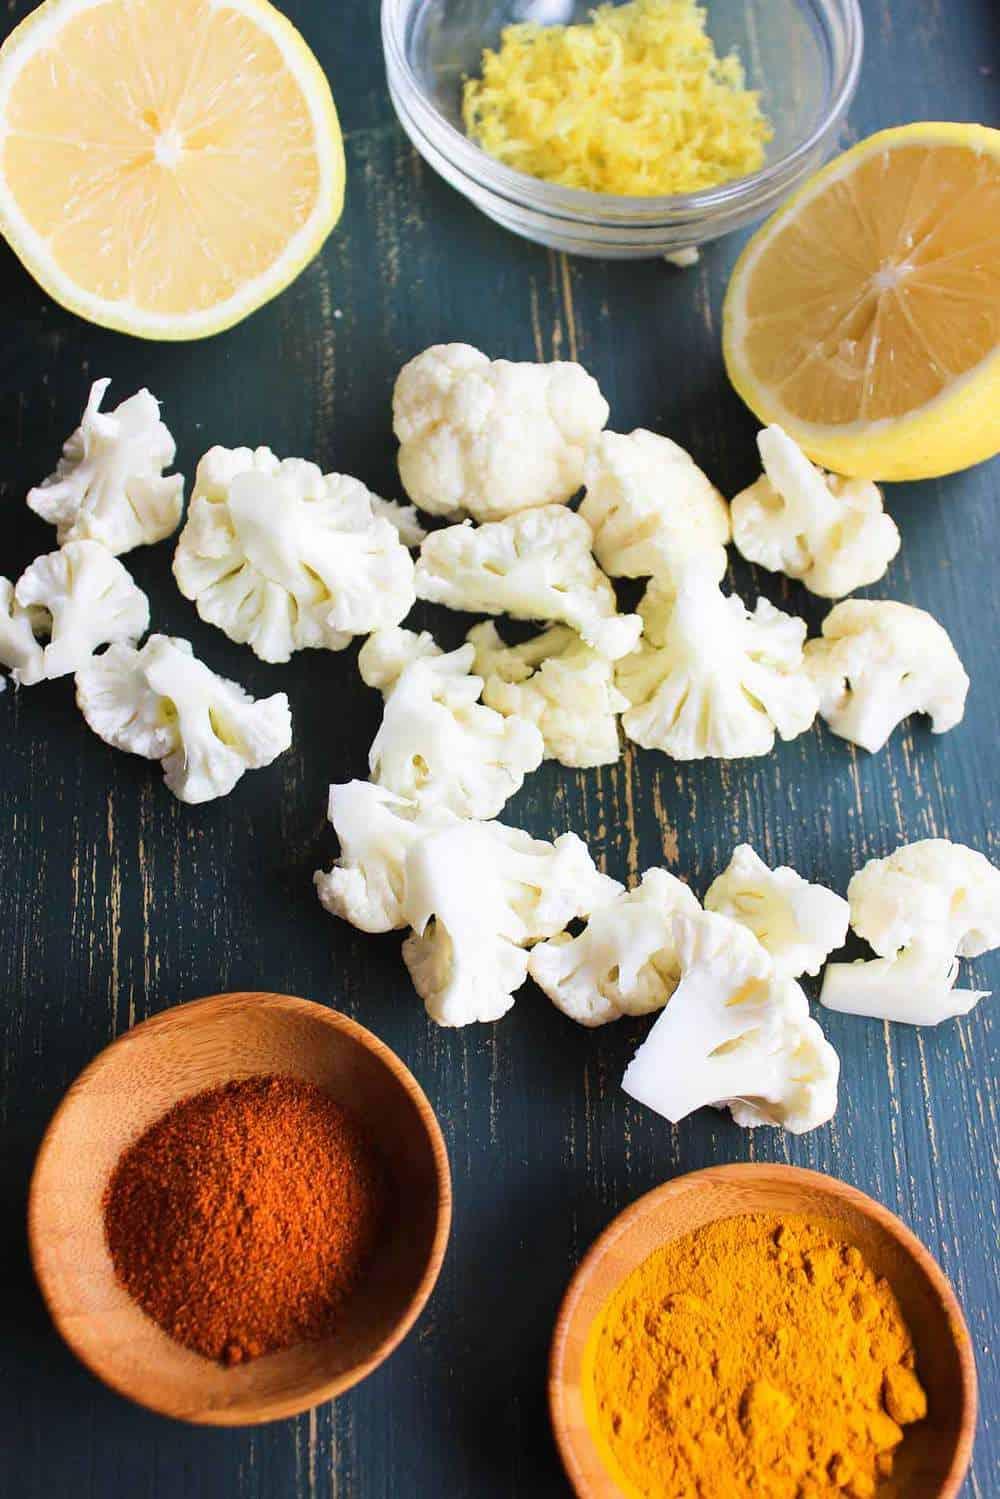 Fried Cauliflower with Lemon recipe